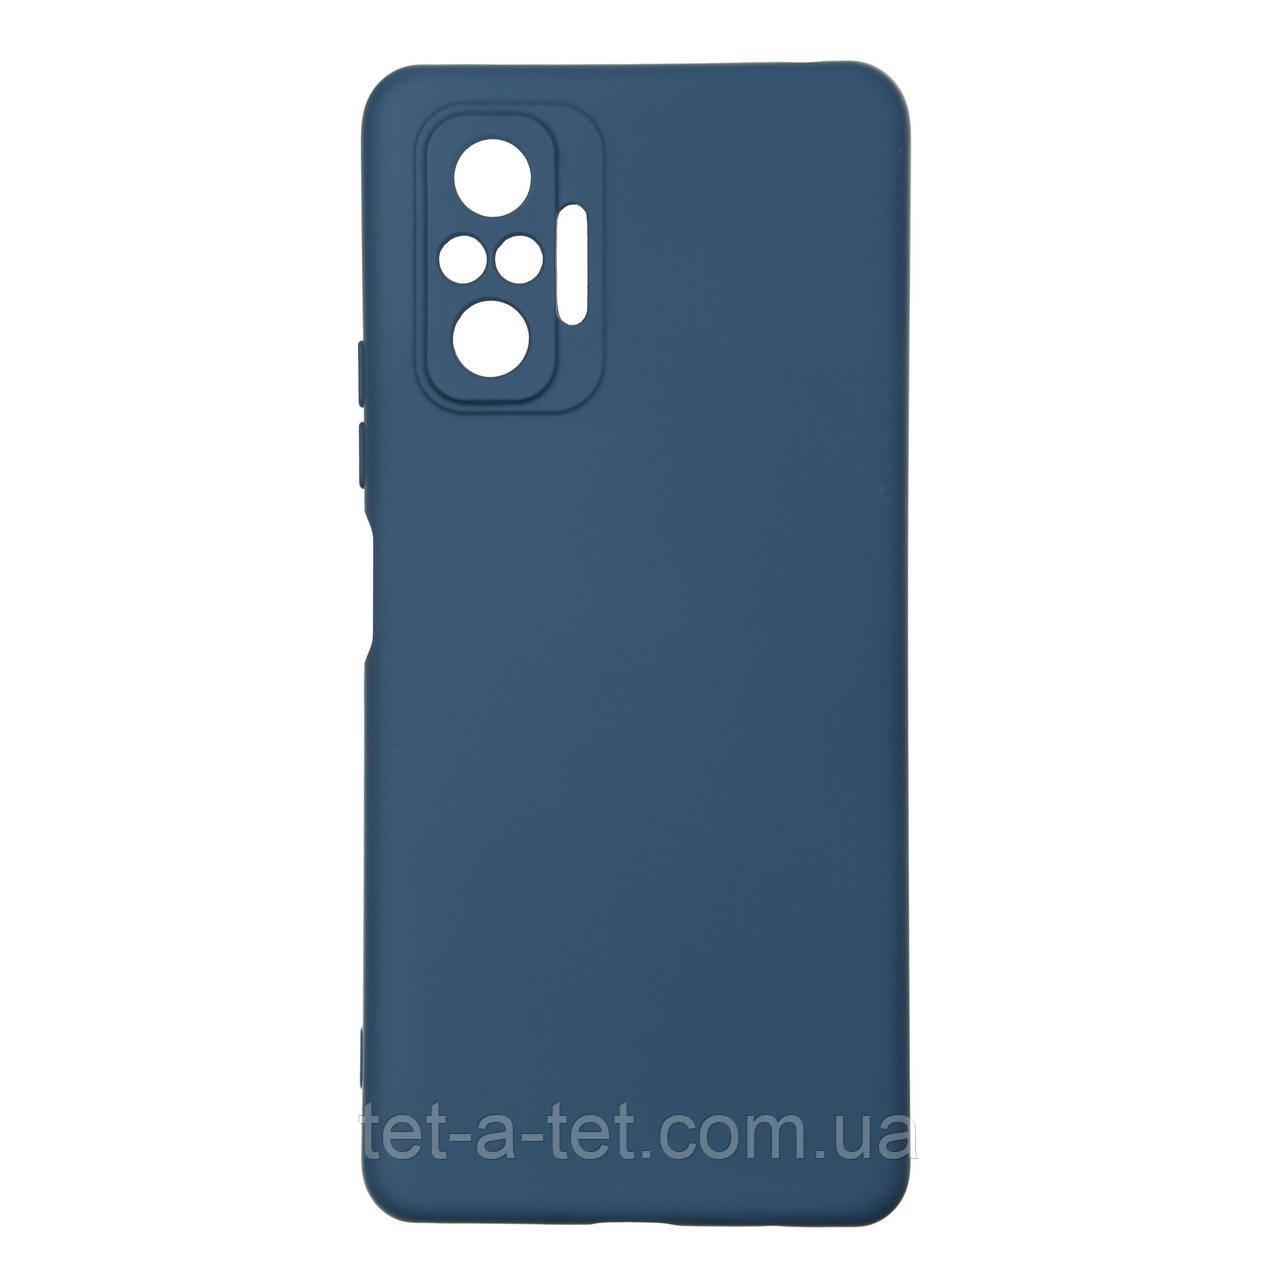 Чохол силіконовий ArmorStandart ICON Case for Xiaomi Redmi Note 10 Pro Dark Blue